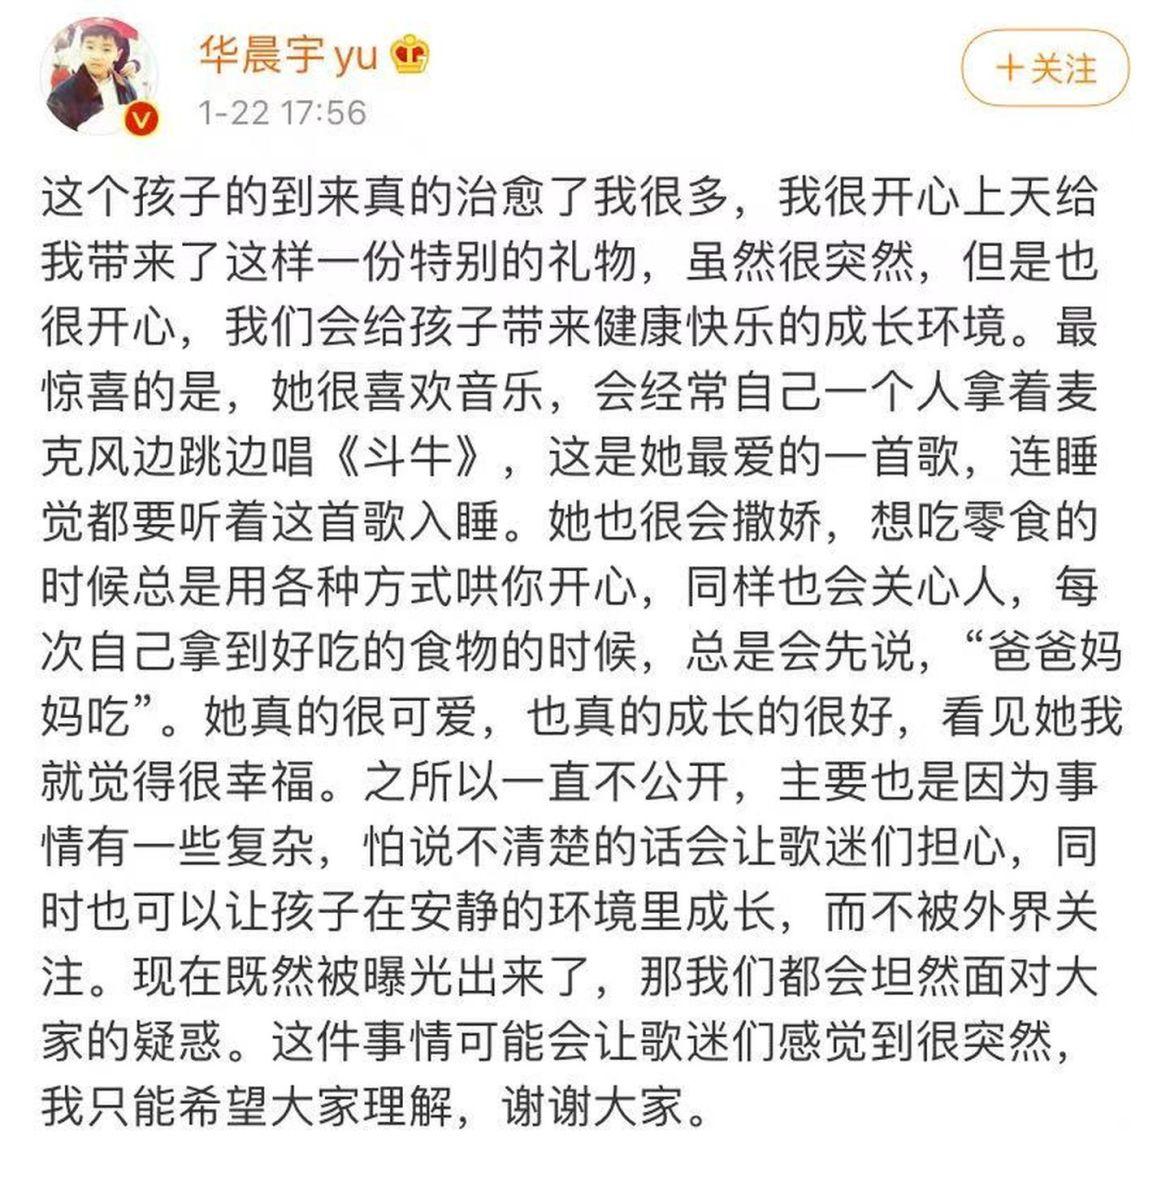 xplodeliao_华晨宇_weibo